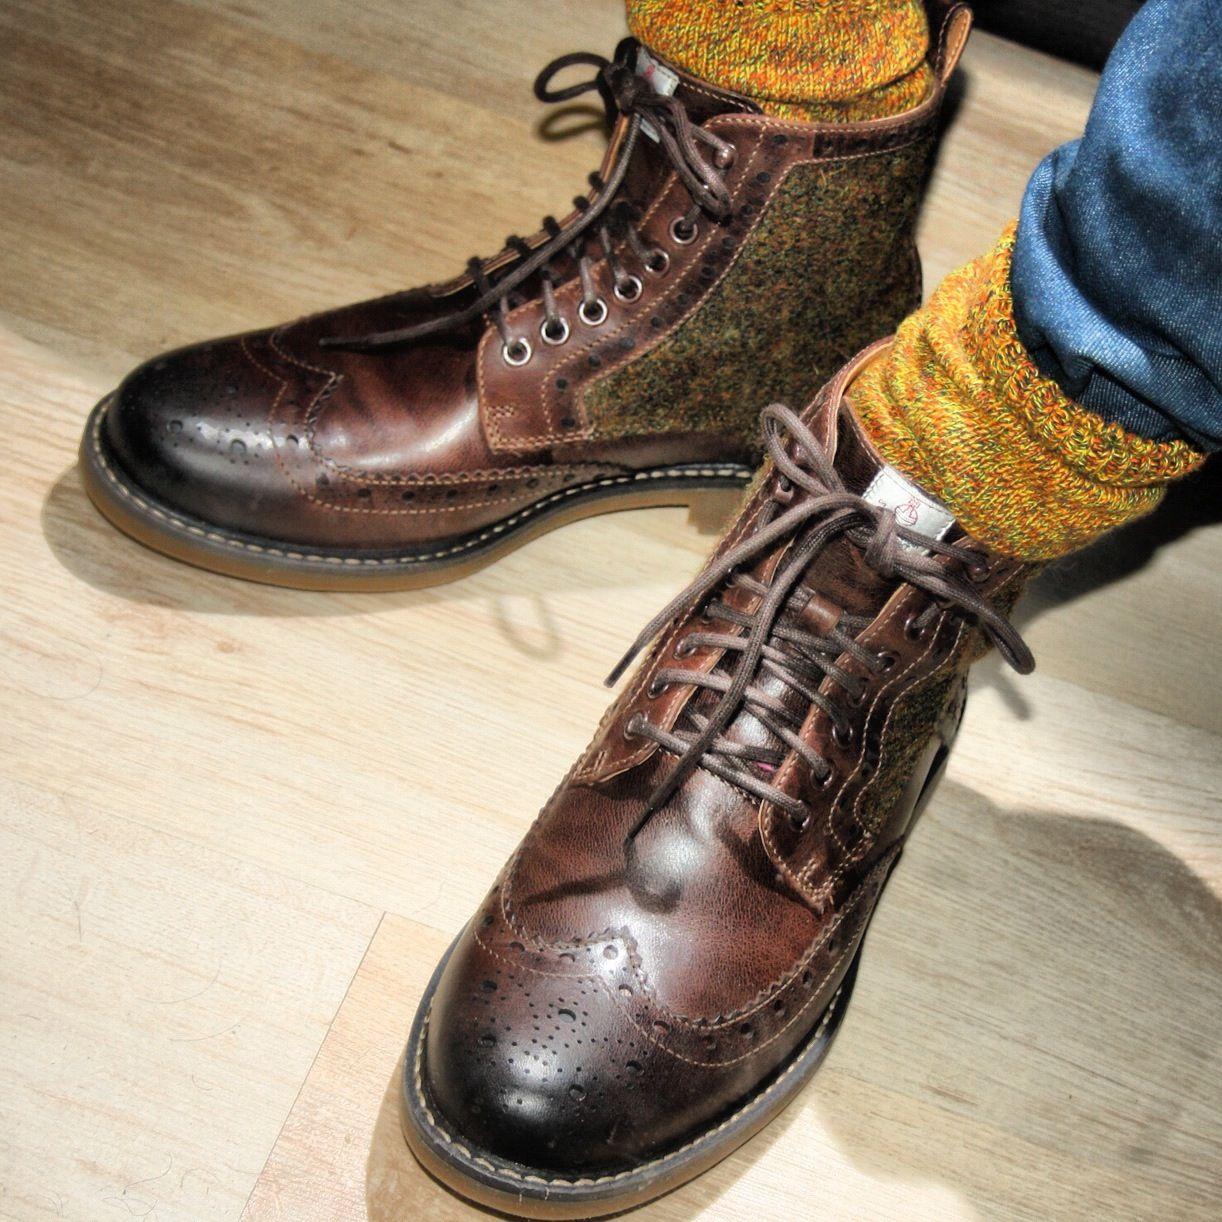 Tan boots rue 21 like timberland. Brand new 89